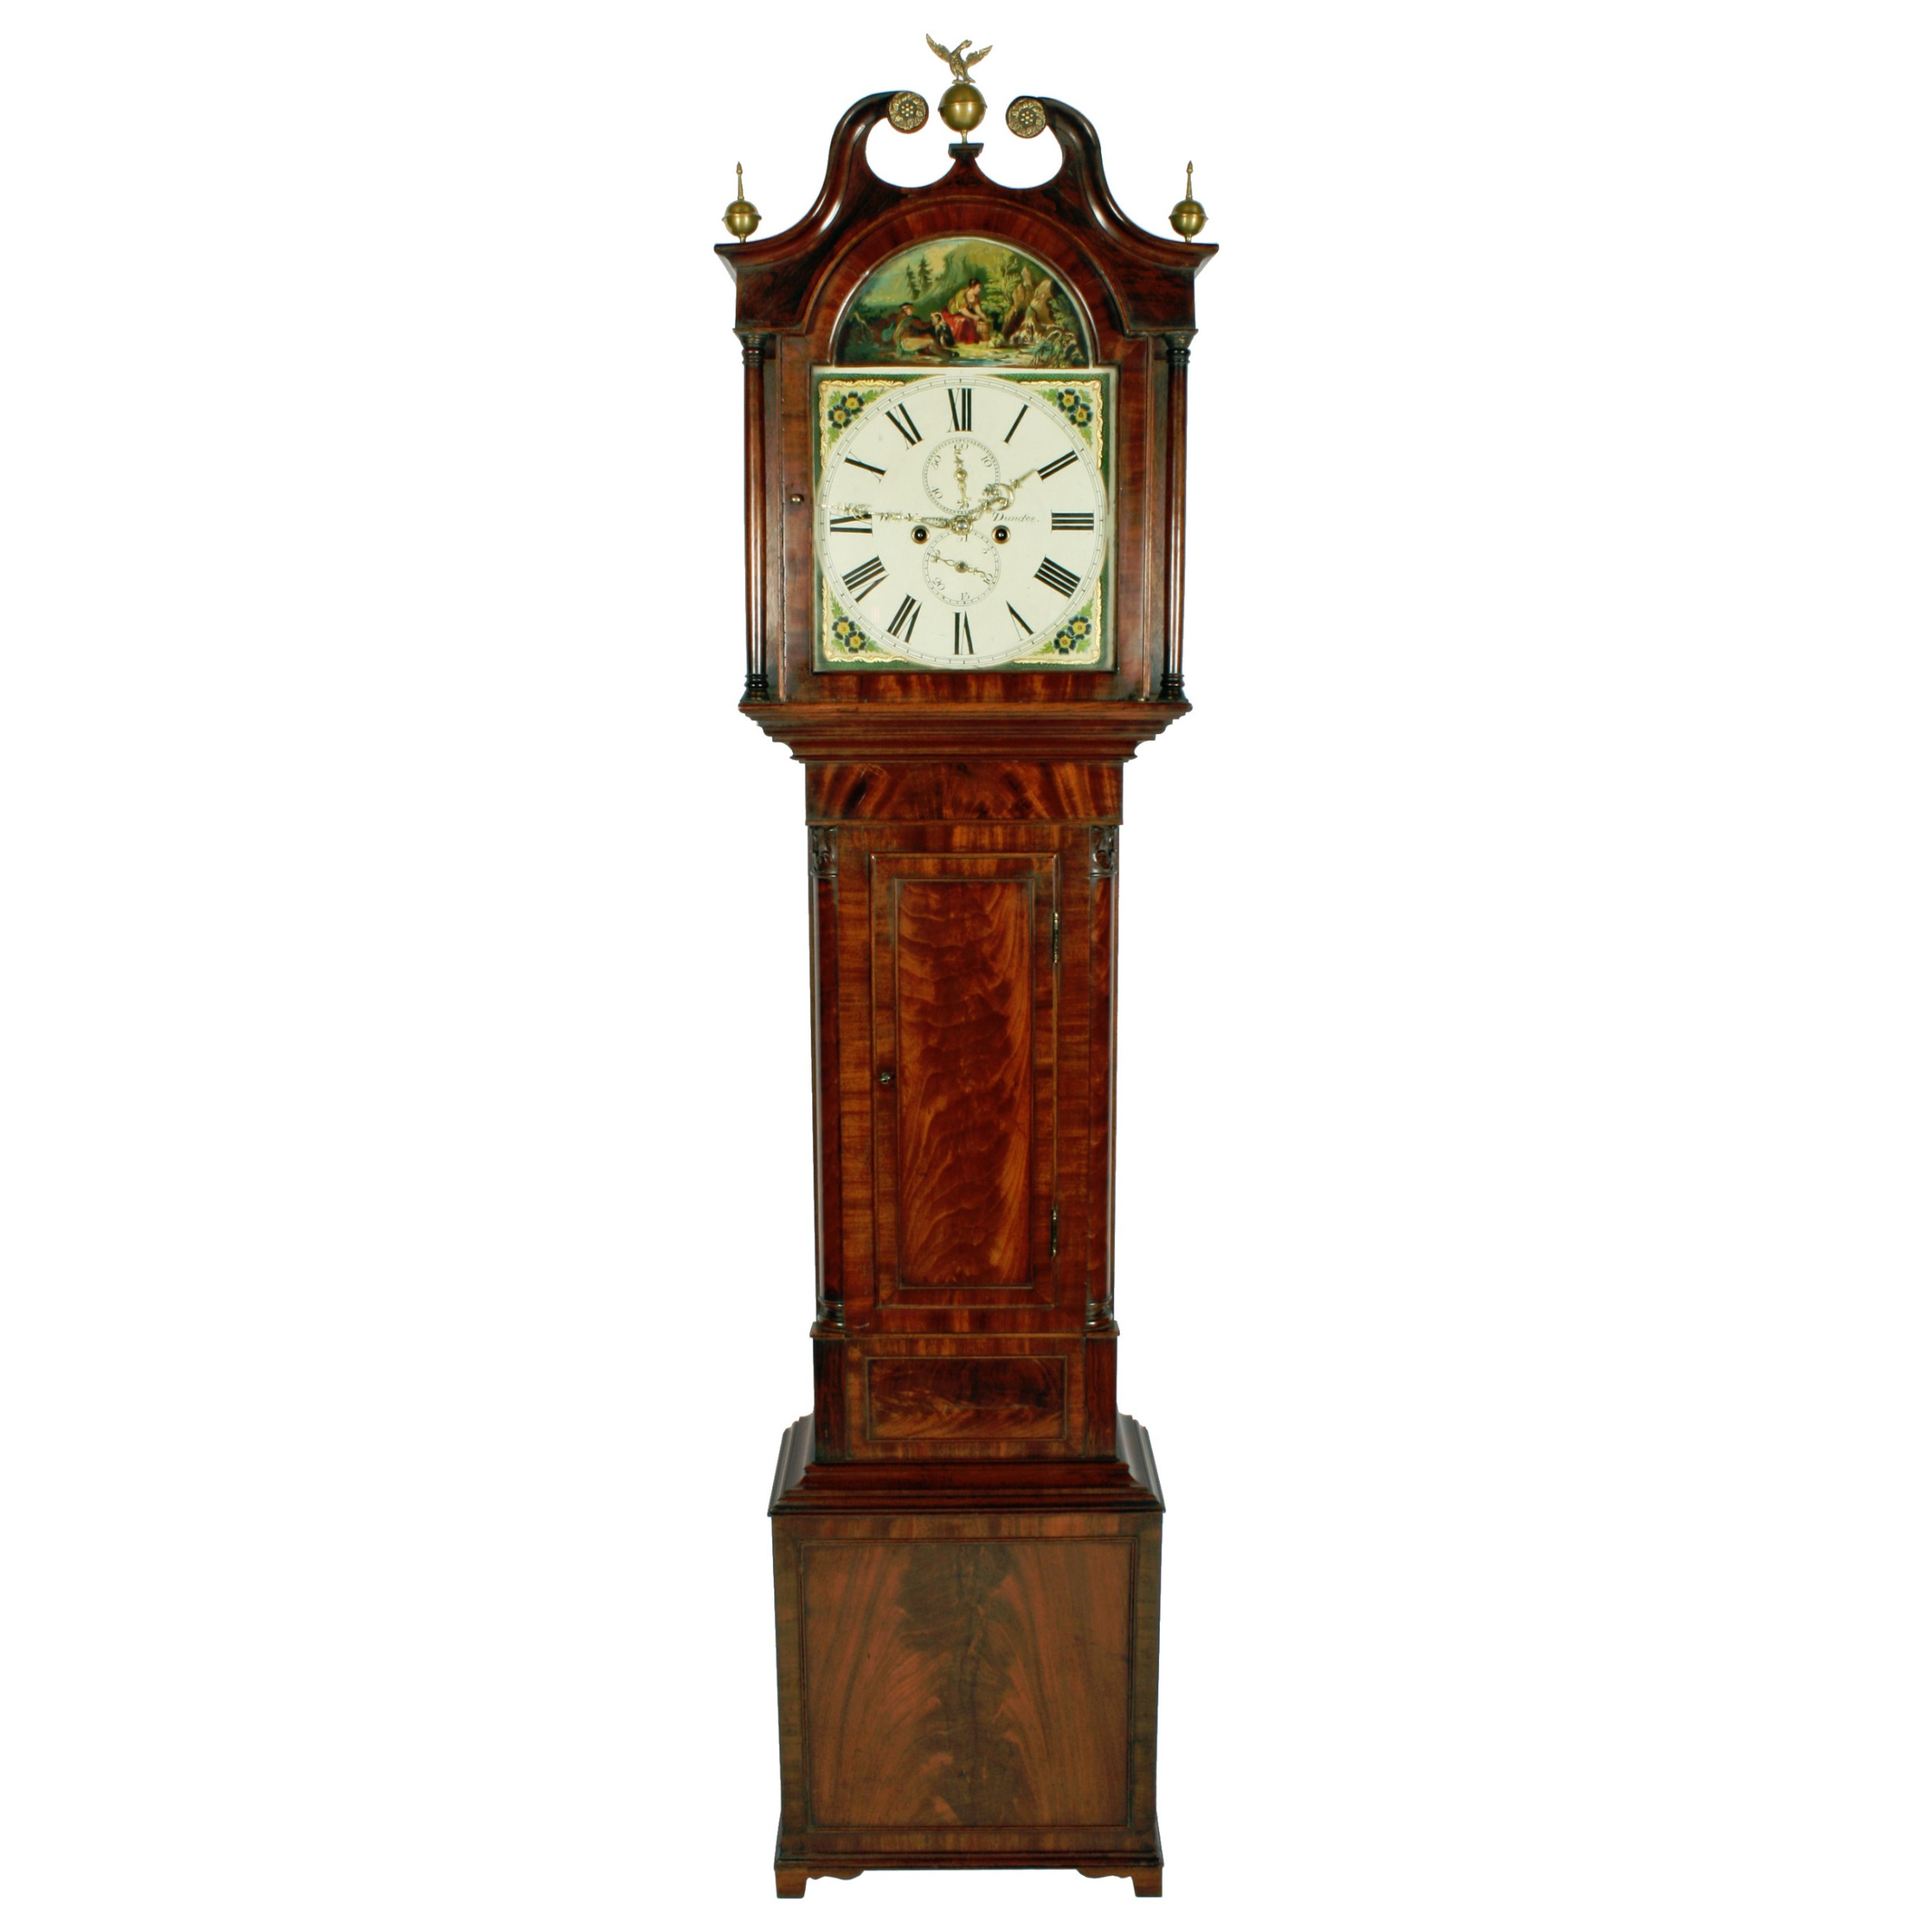 georgian painted dial grandfather clock